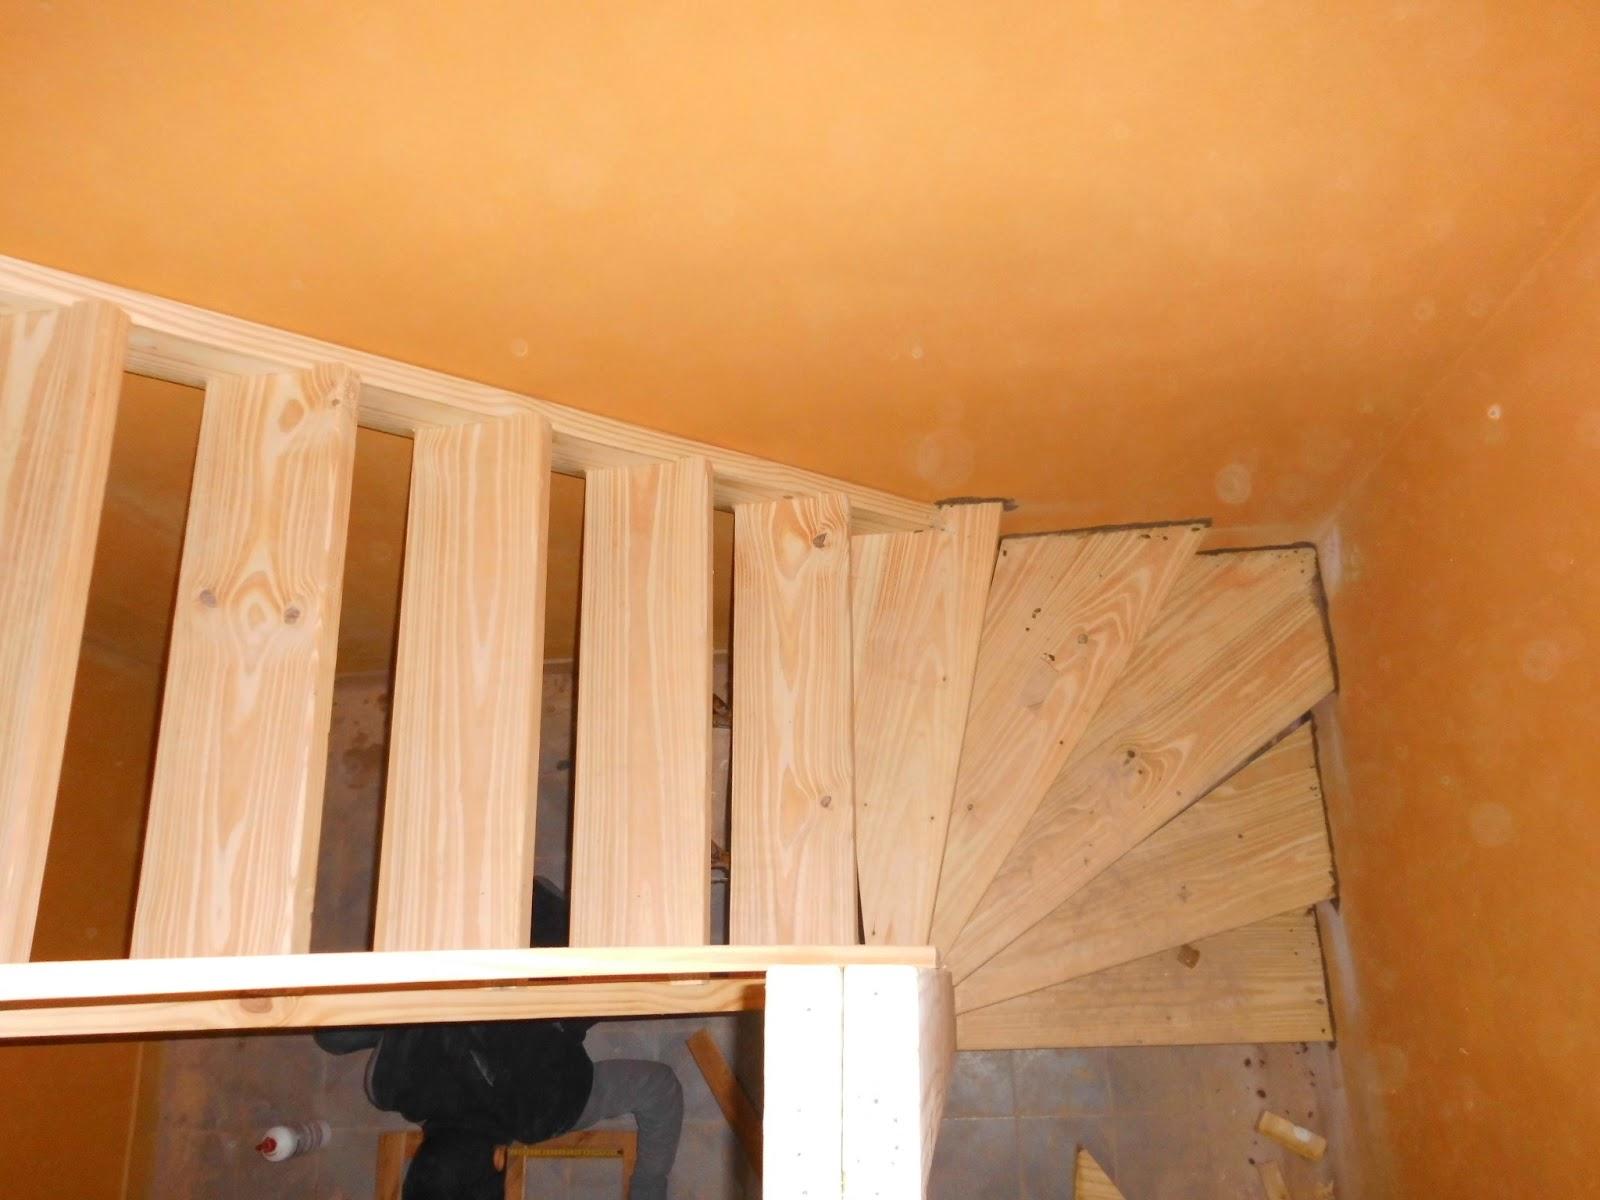 Entrepisos de madera escaleras escaleras - Escaleras antiguas de madera ...